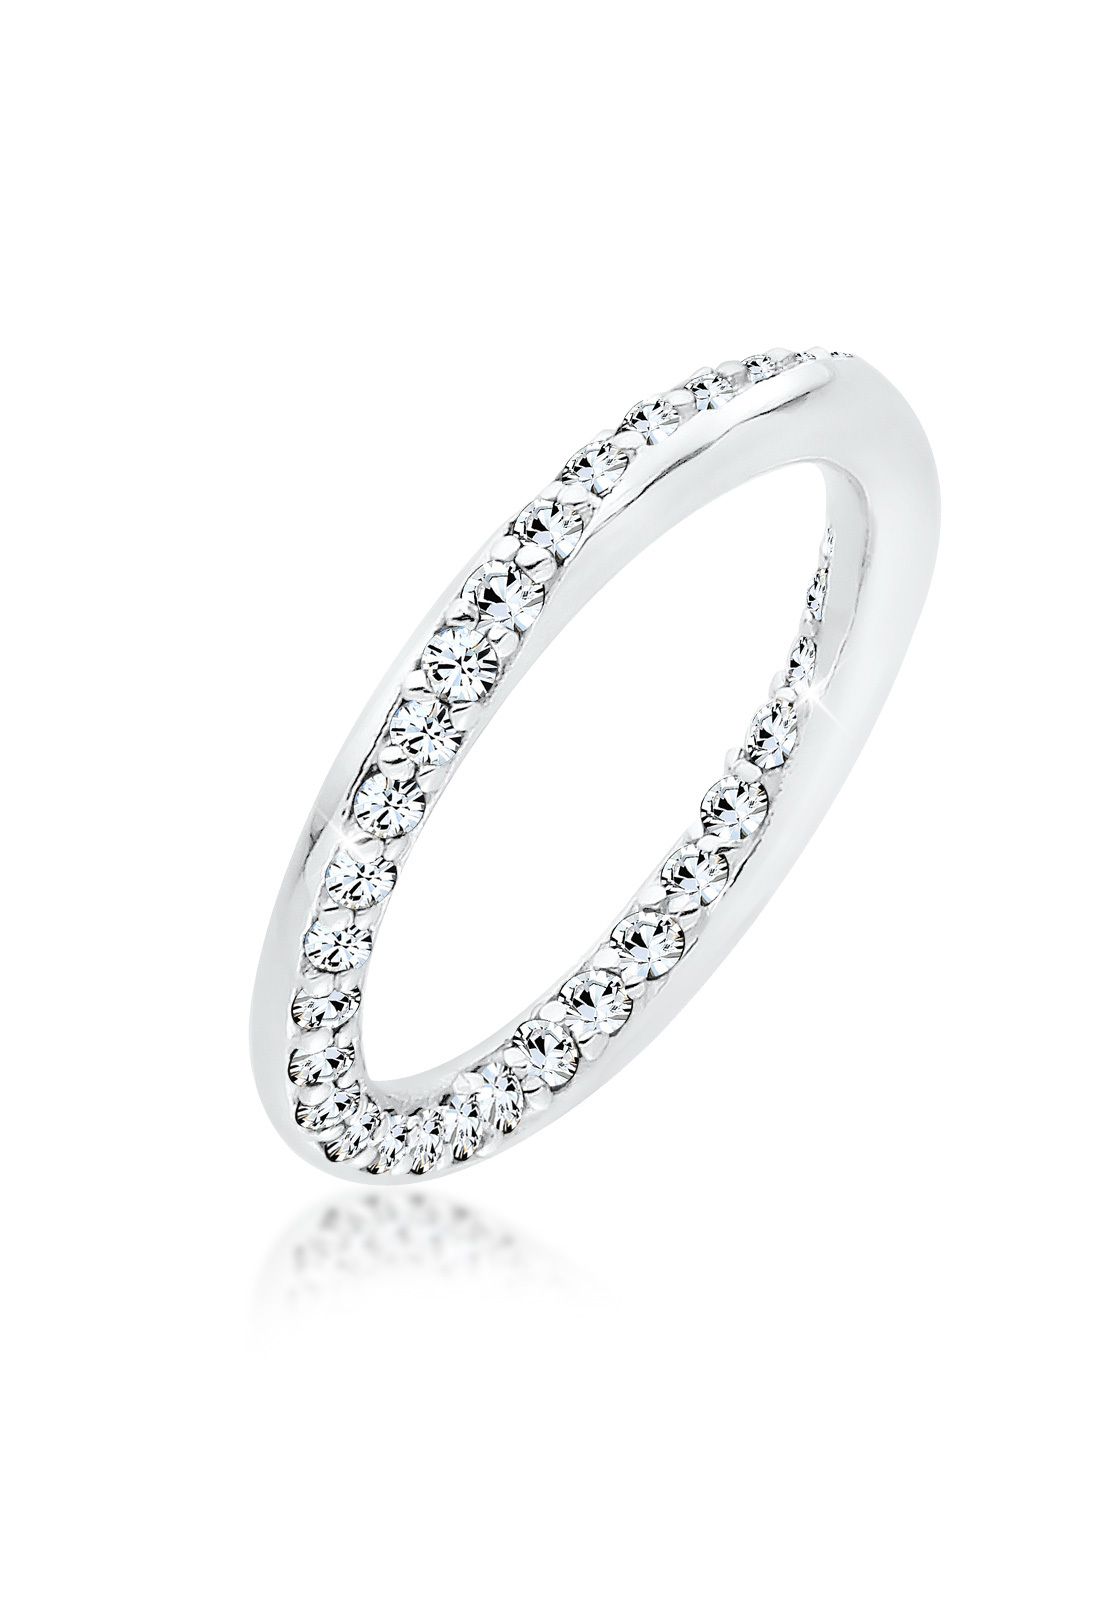 Ring   Kristall ( Weiß )   925er Sterling Silber